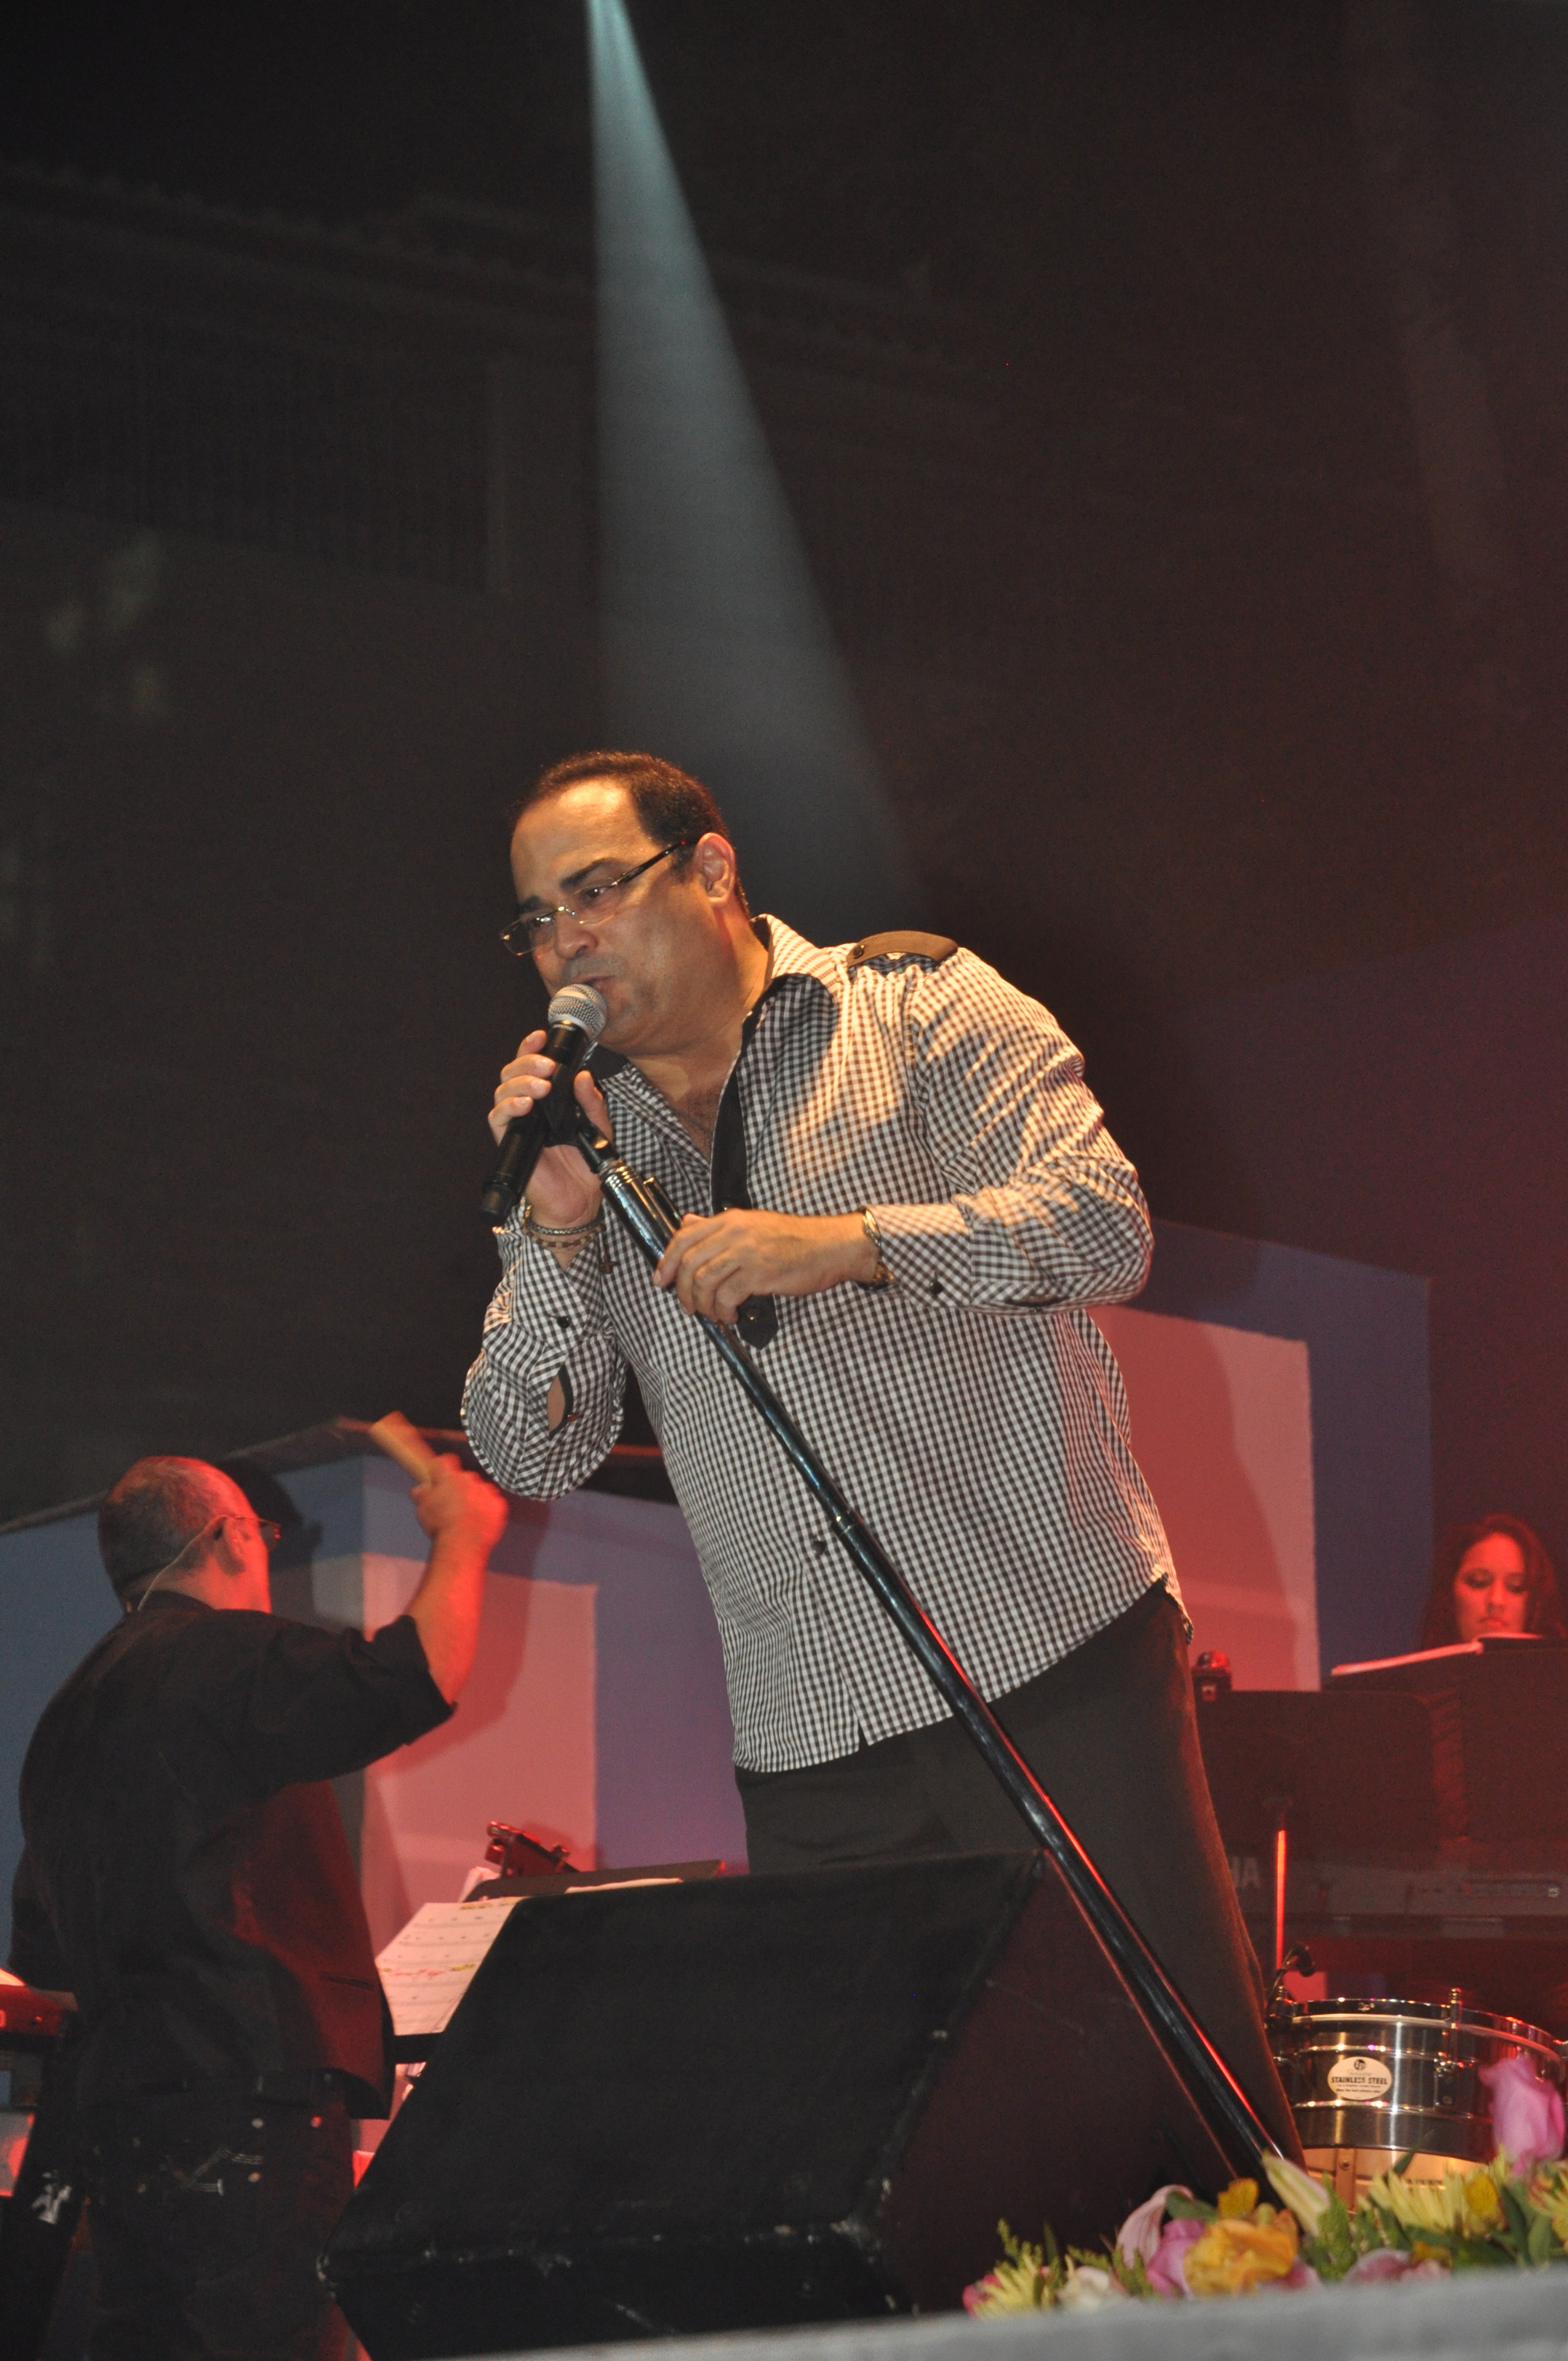 Depiction of Gilberto Santa Rosa